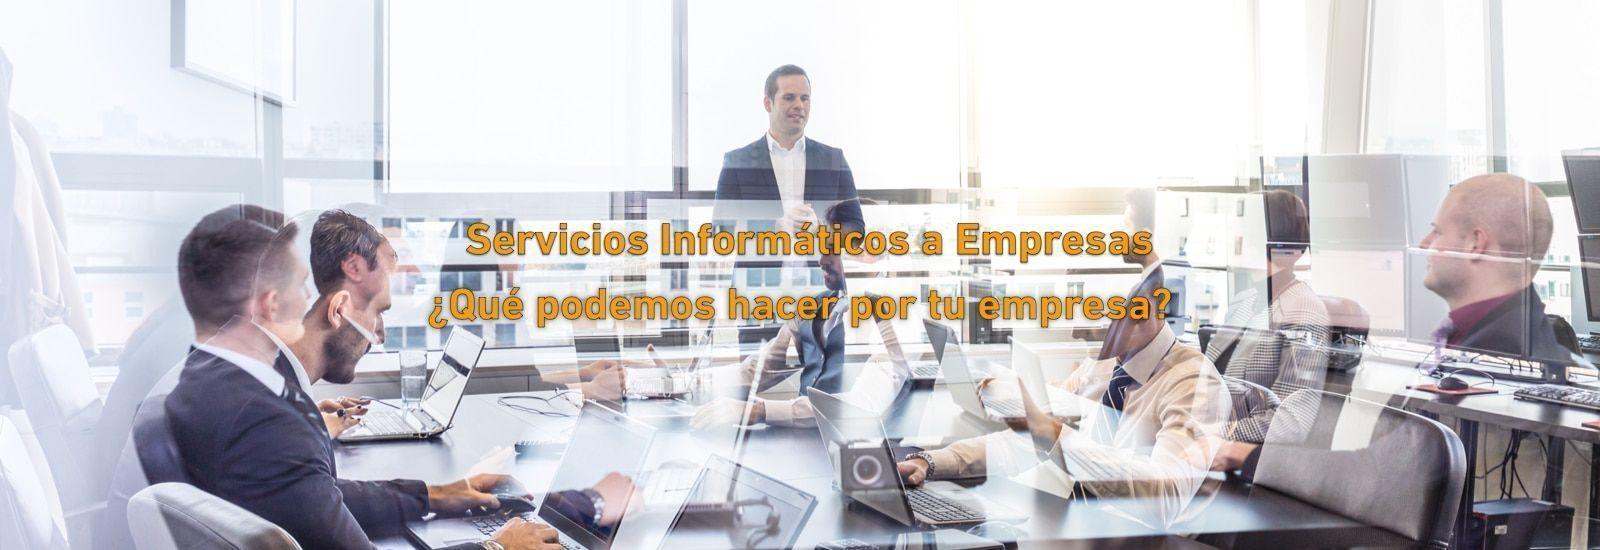 consultoria informatica para empresas